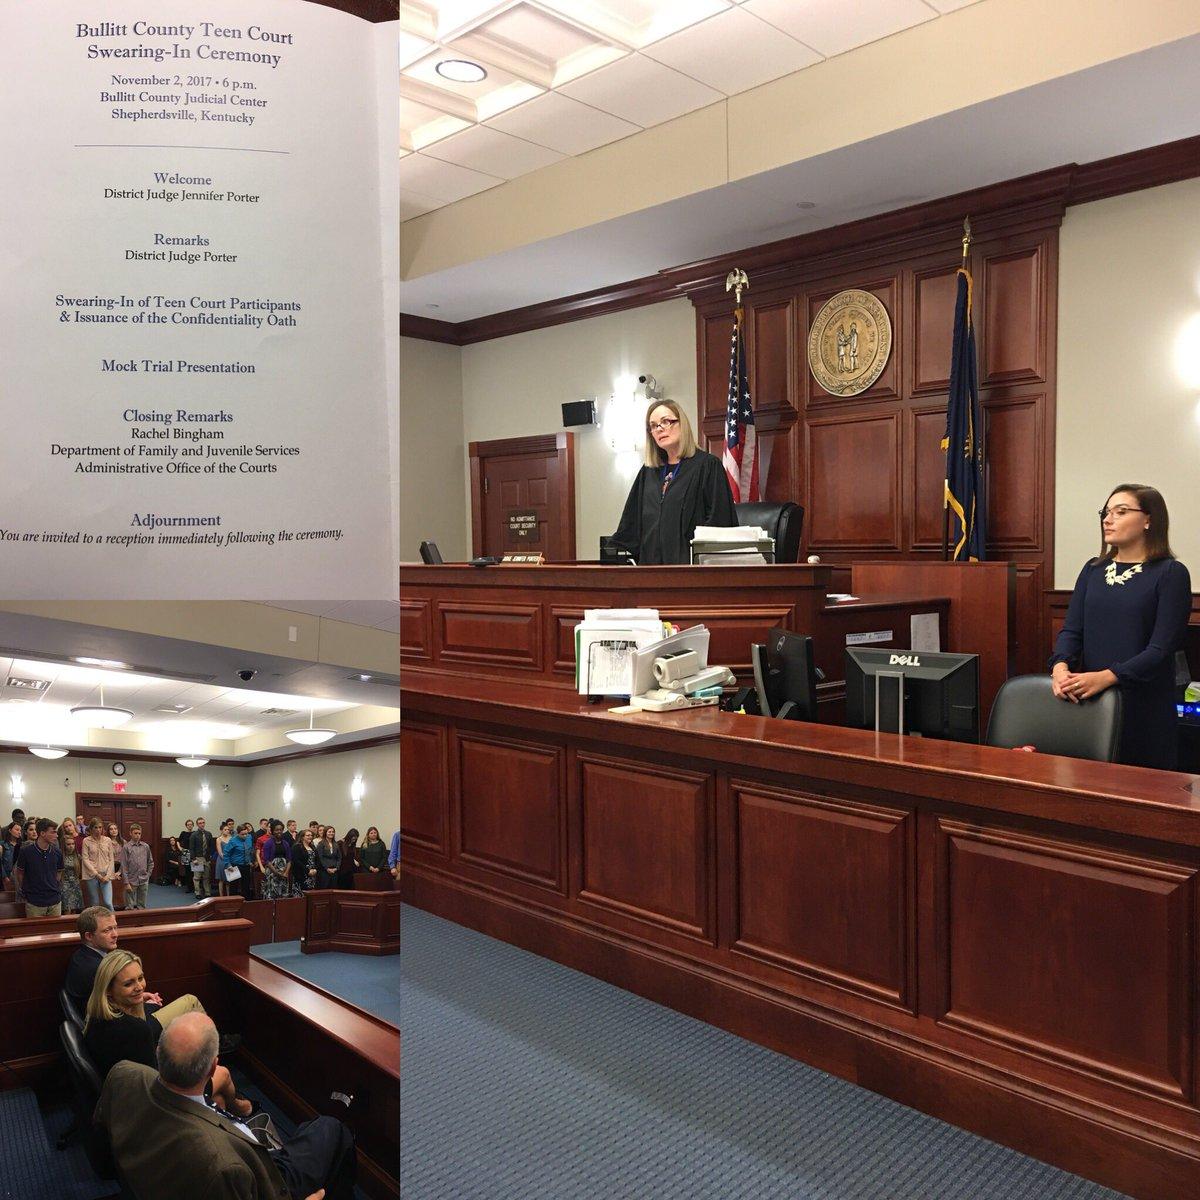 Baker county teen court, jennifer morrison naked breasts